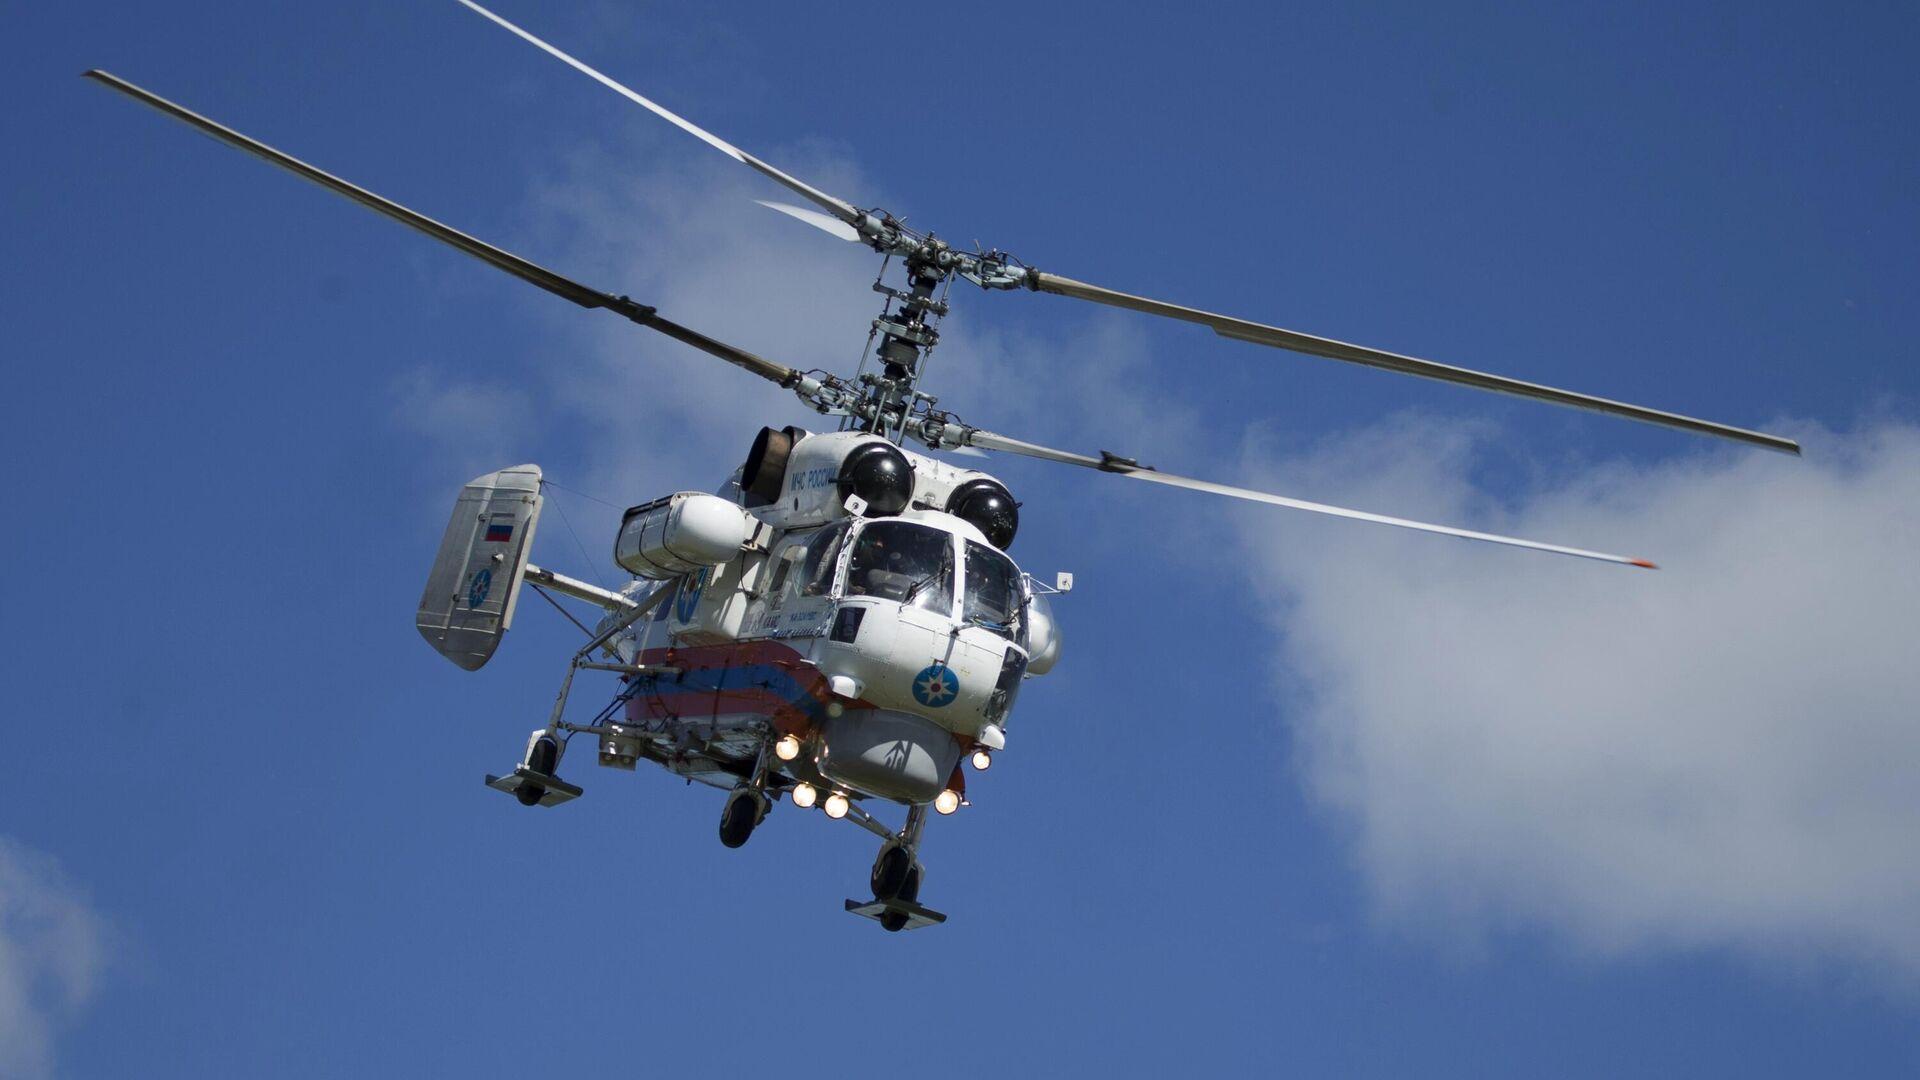 Un helicóptero Ka-32 del Ministerio de Emergencias de Rusia (Archivo) - Sputnik Mundo, 1920, 25.03.2021